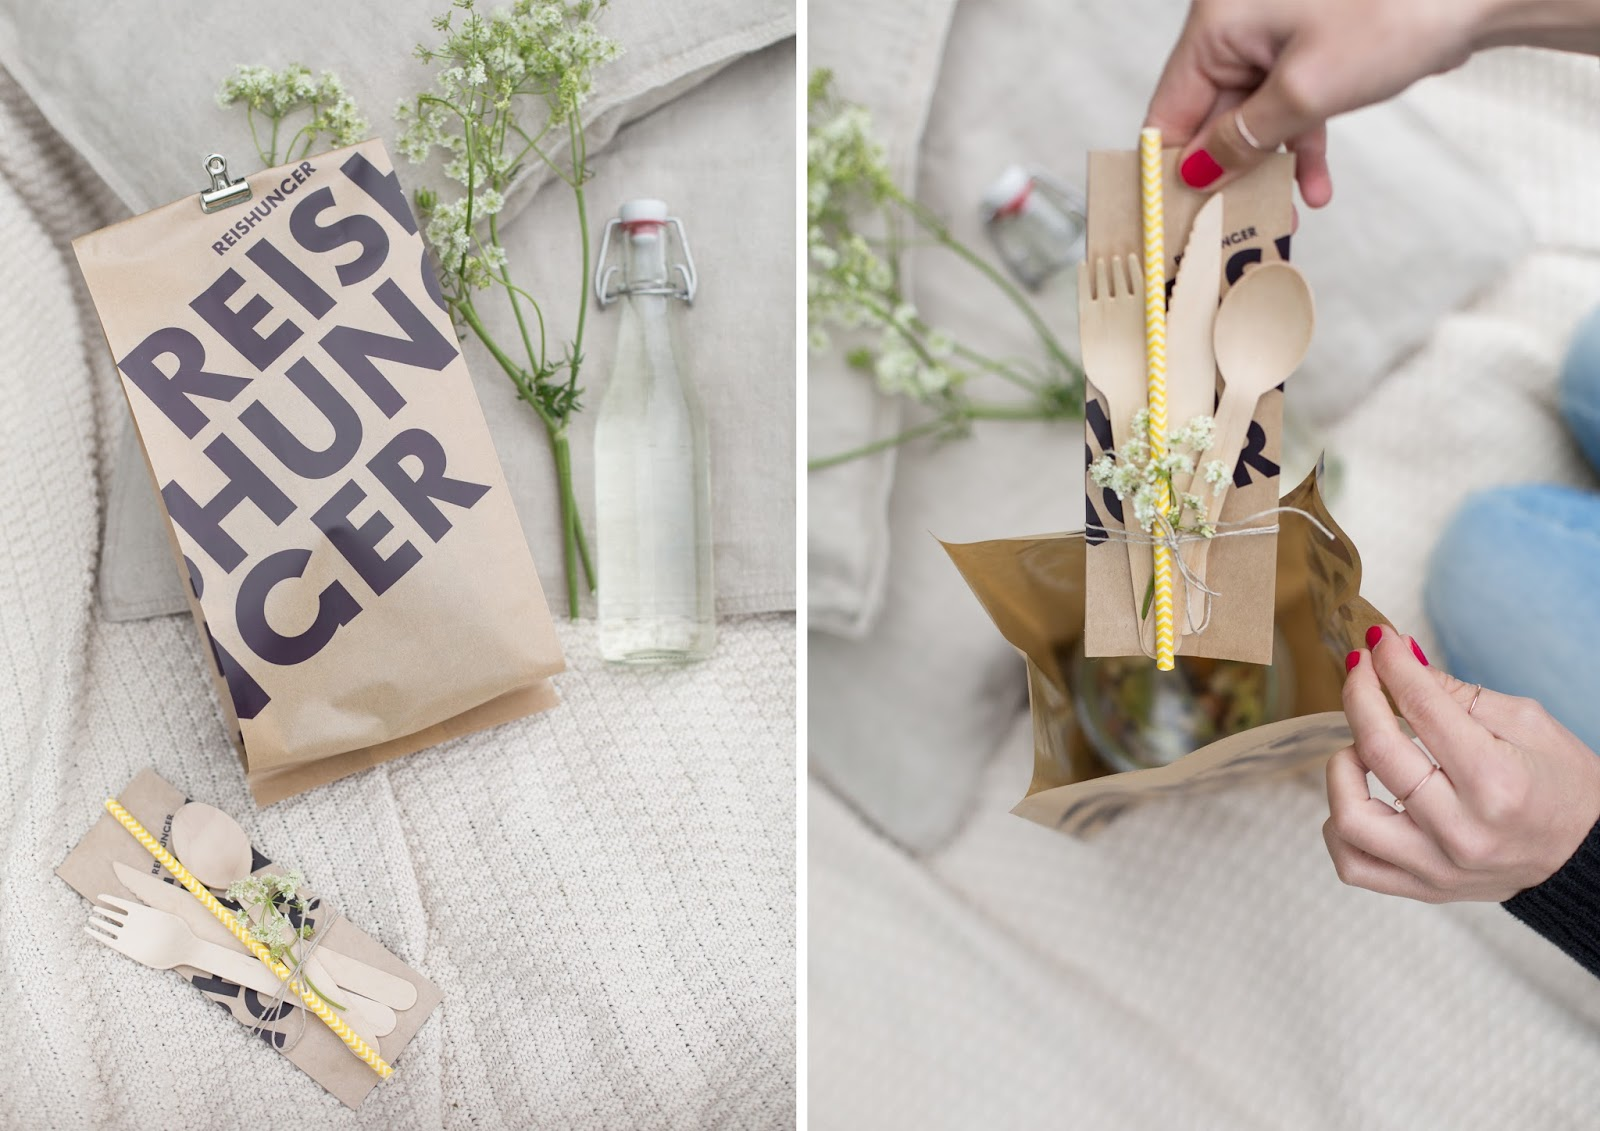 Bestecktüten DIY Reistüten Upcycling